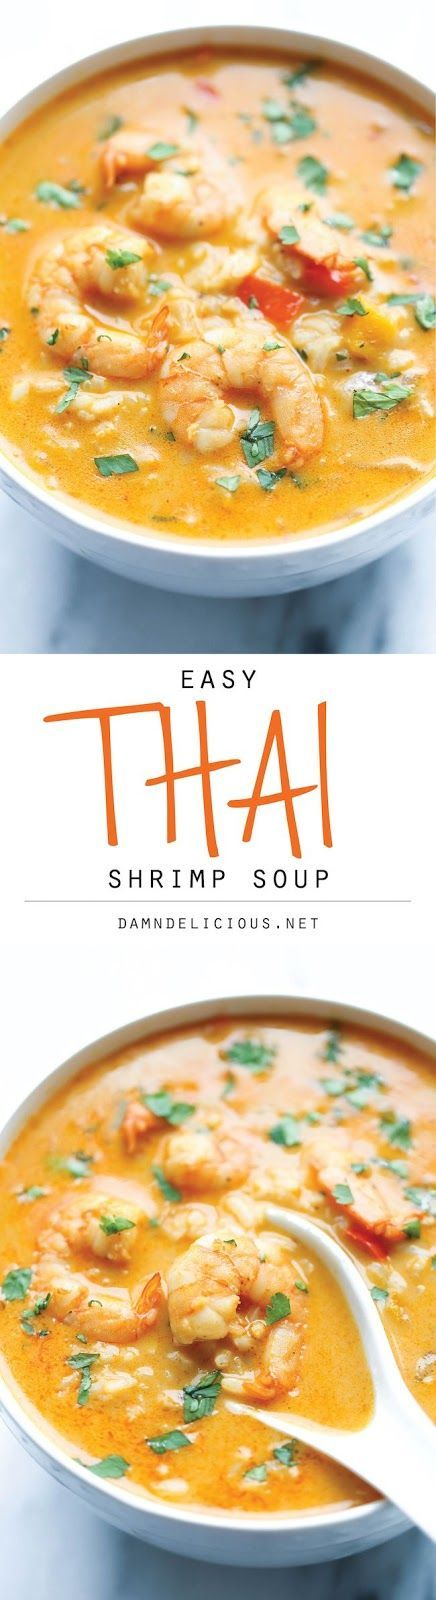 One Of The Best Recipes,Amazingly Tasty Thai Shrimp Soup   DIY Beauty Fashion